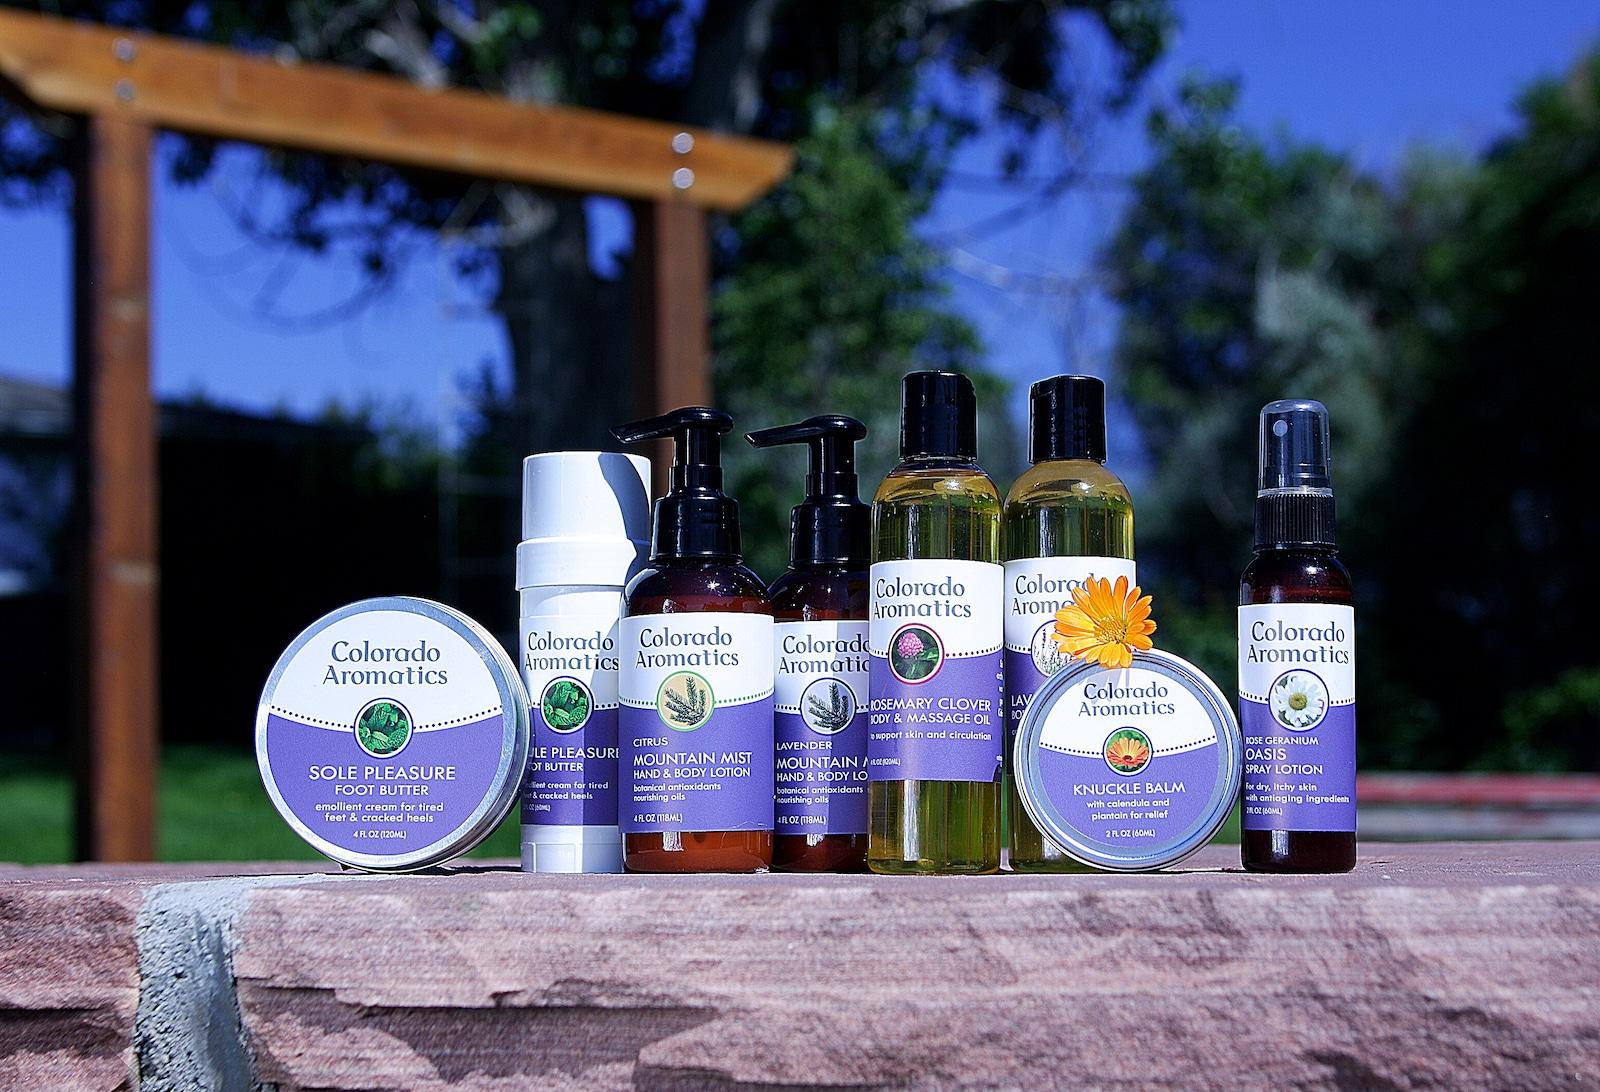 Image of Colorado Aromatics body products